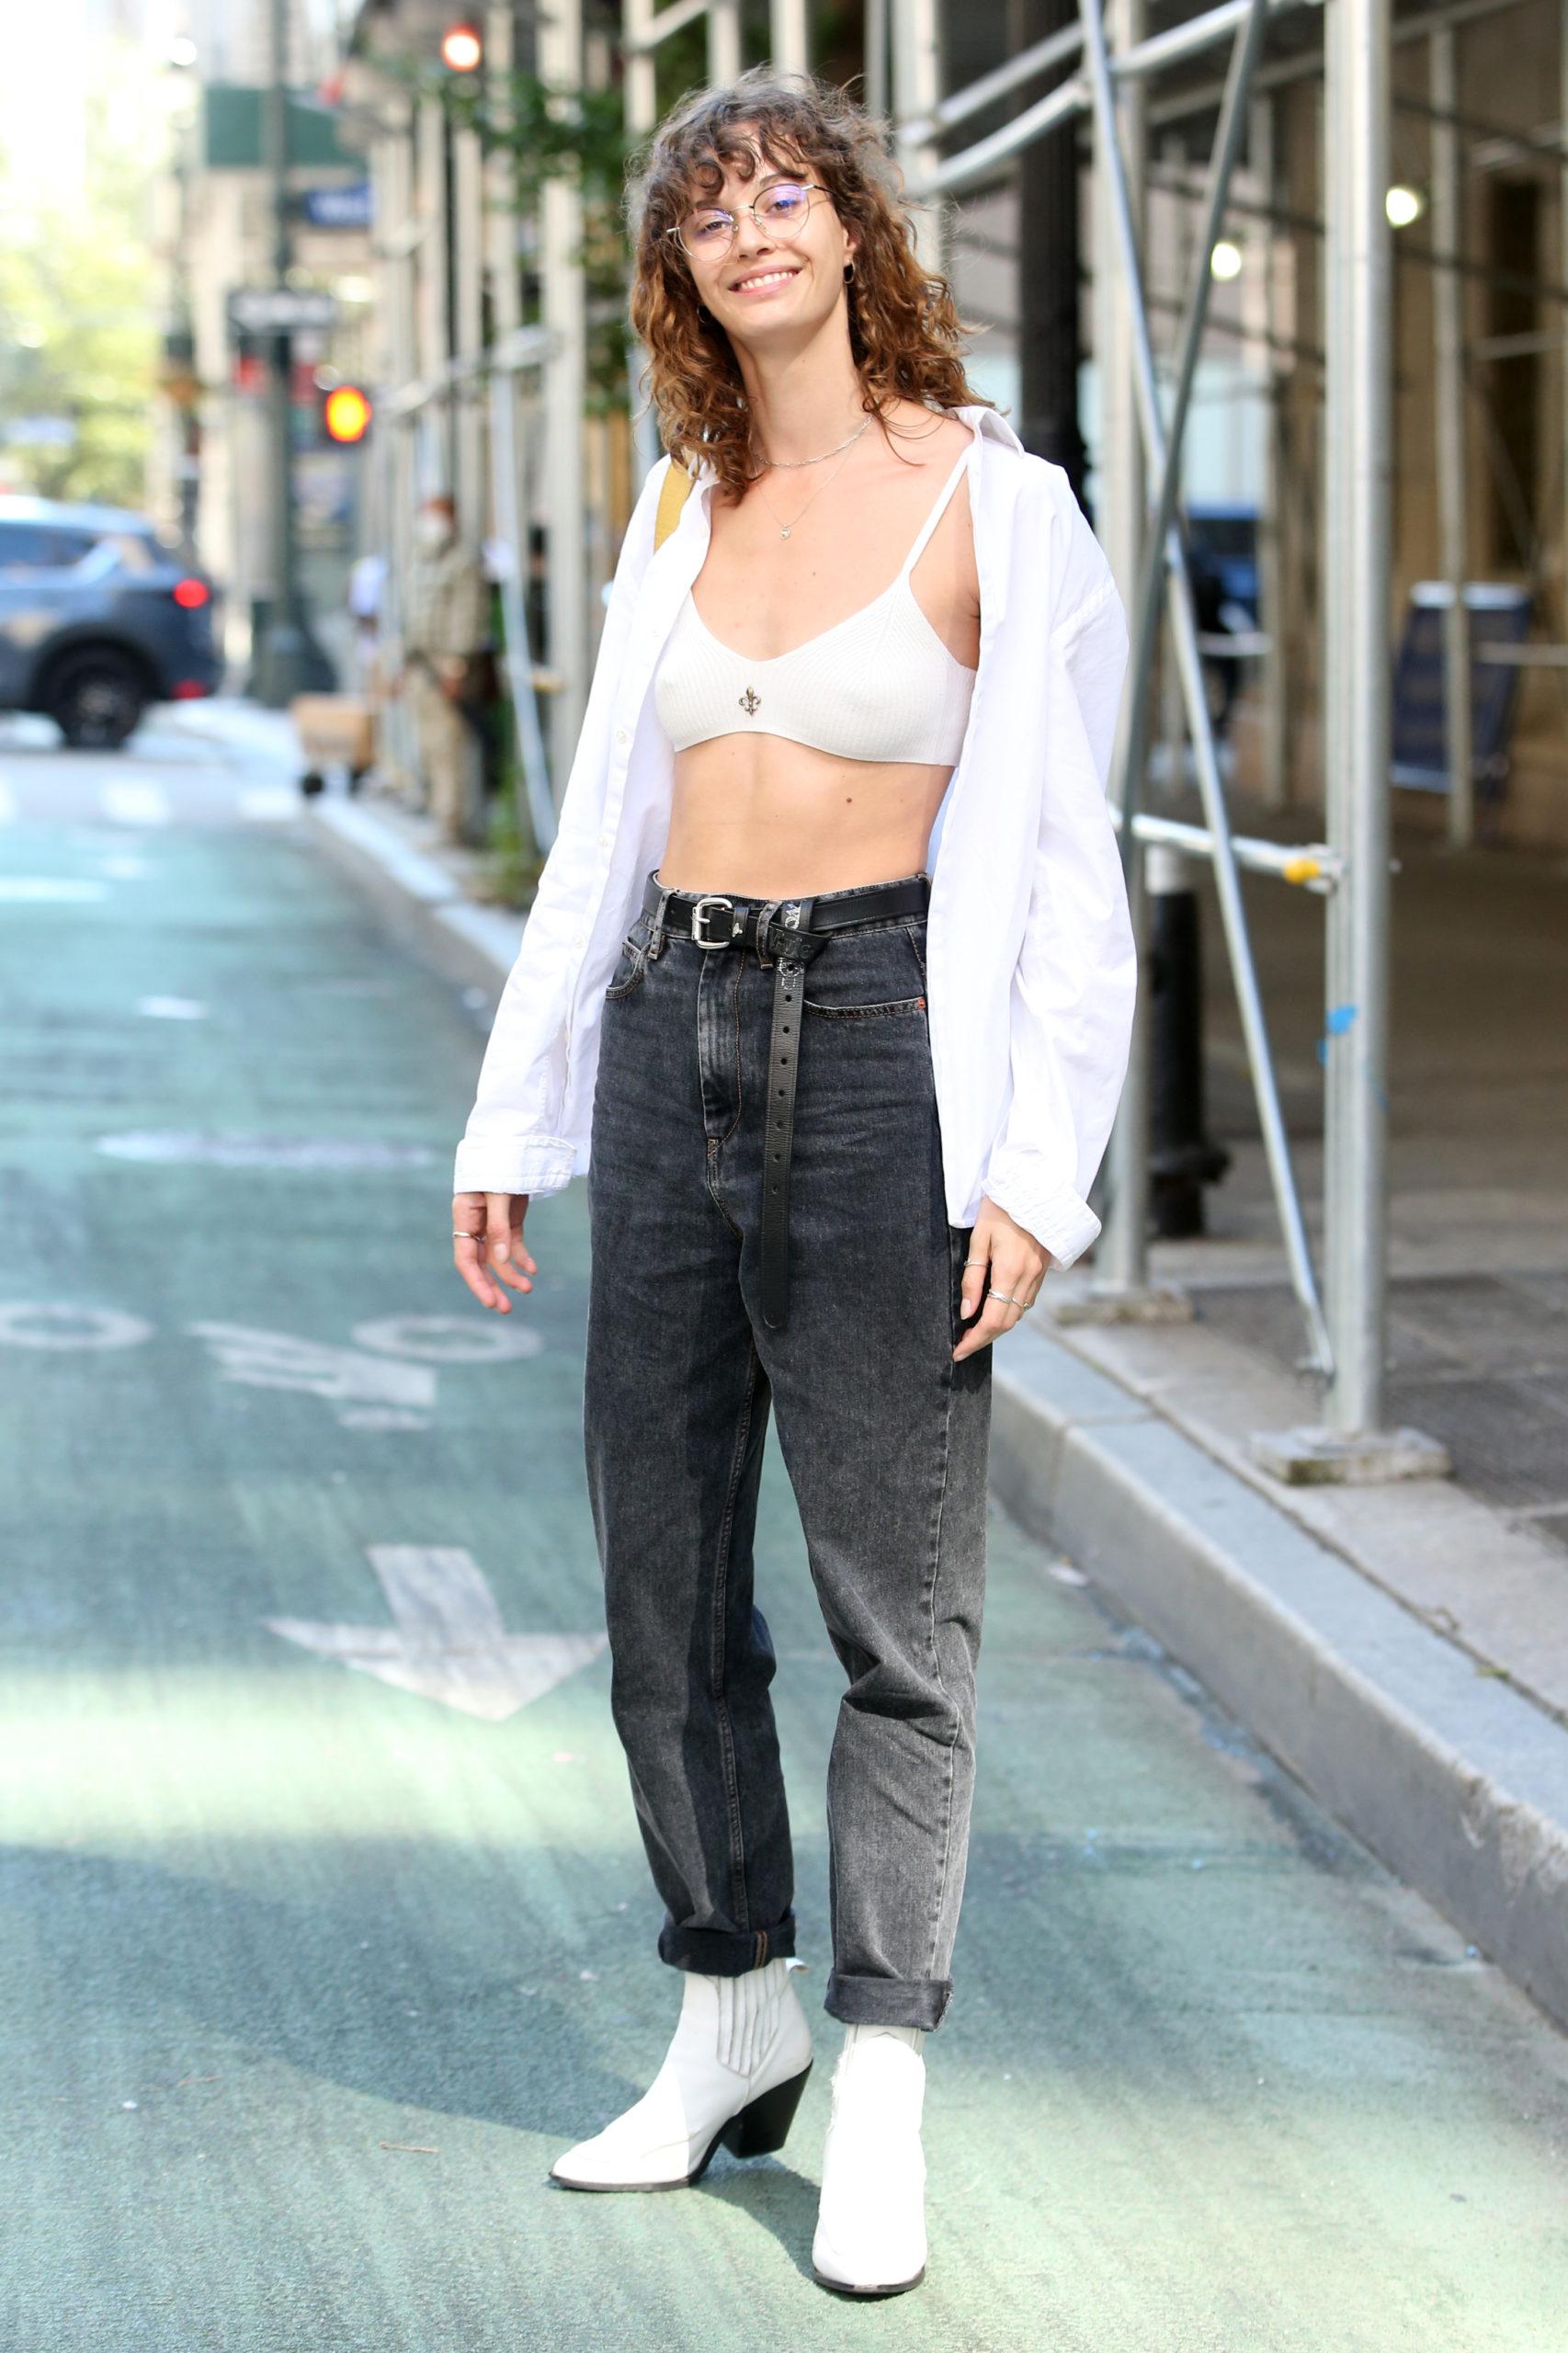 Kamala Harris' Stepdaughter Ella Emhoff. New York City, USA (Photo credit: Christopher Peterson / SplashNews.com)